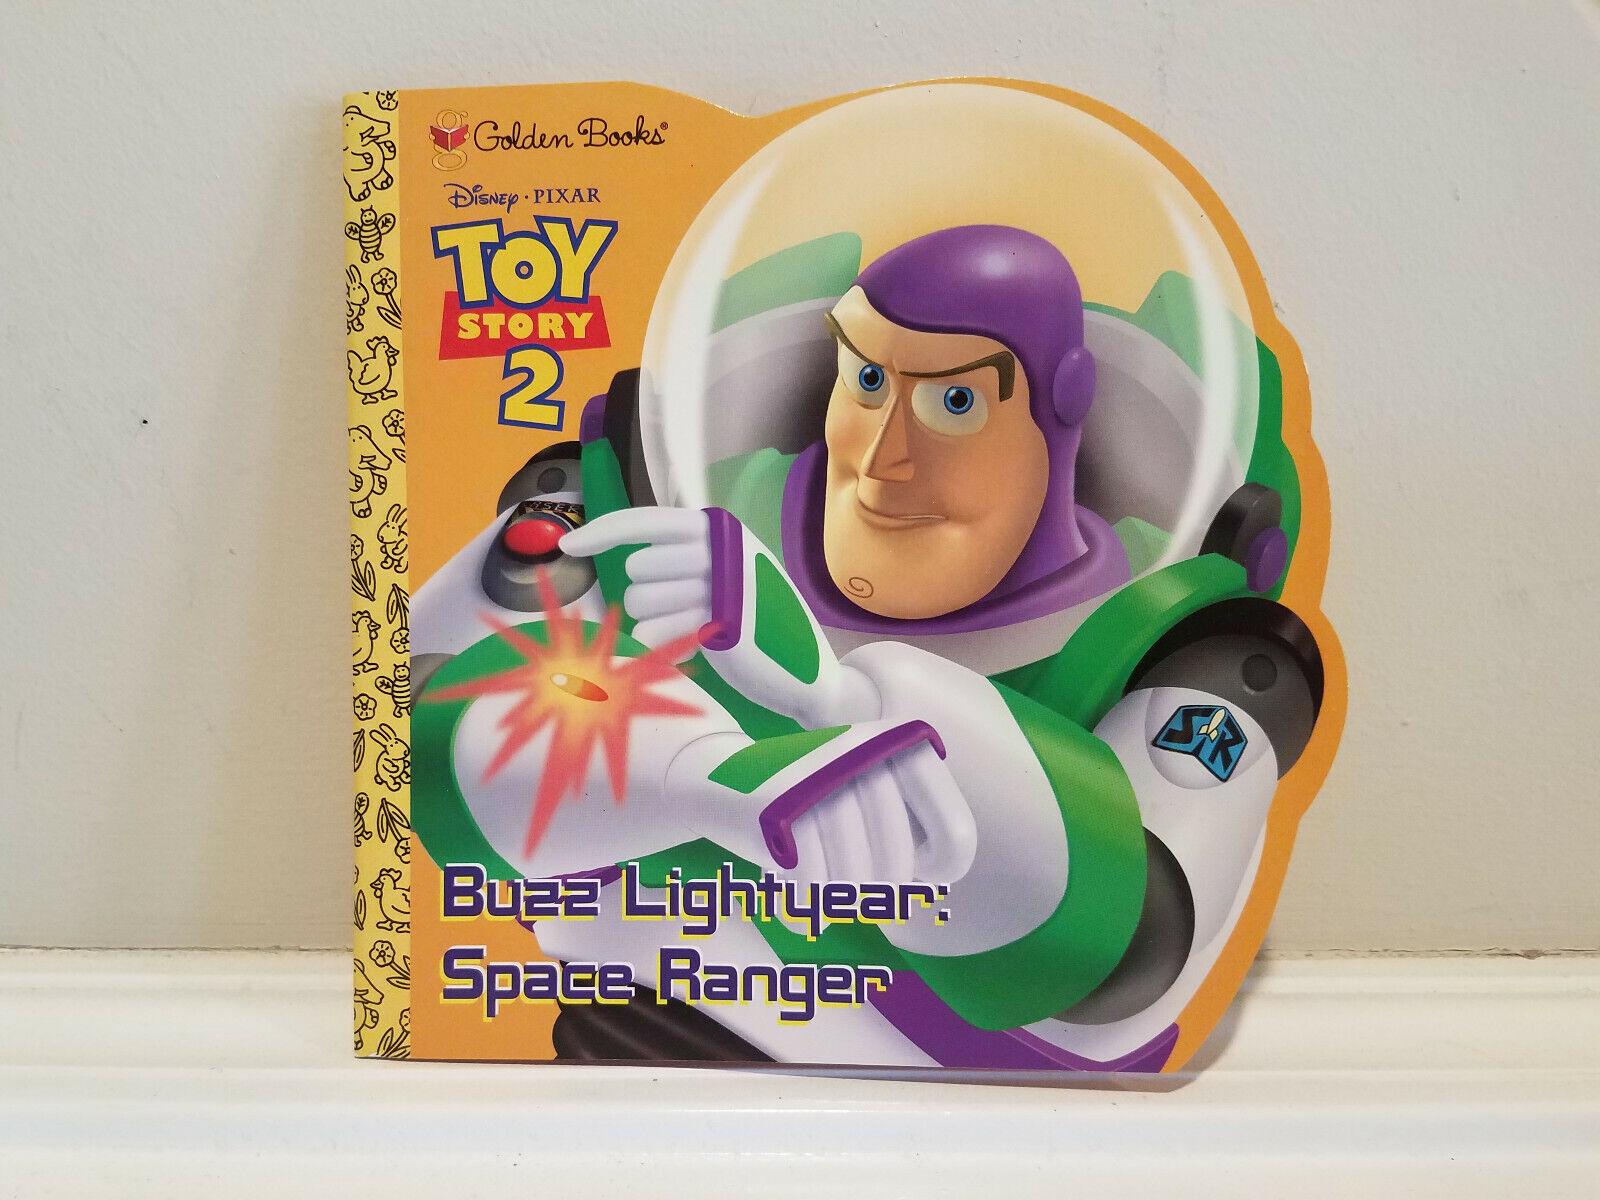 Golden Books Disney Pixar Toy Story 2 Buzz Lightyear Space R